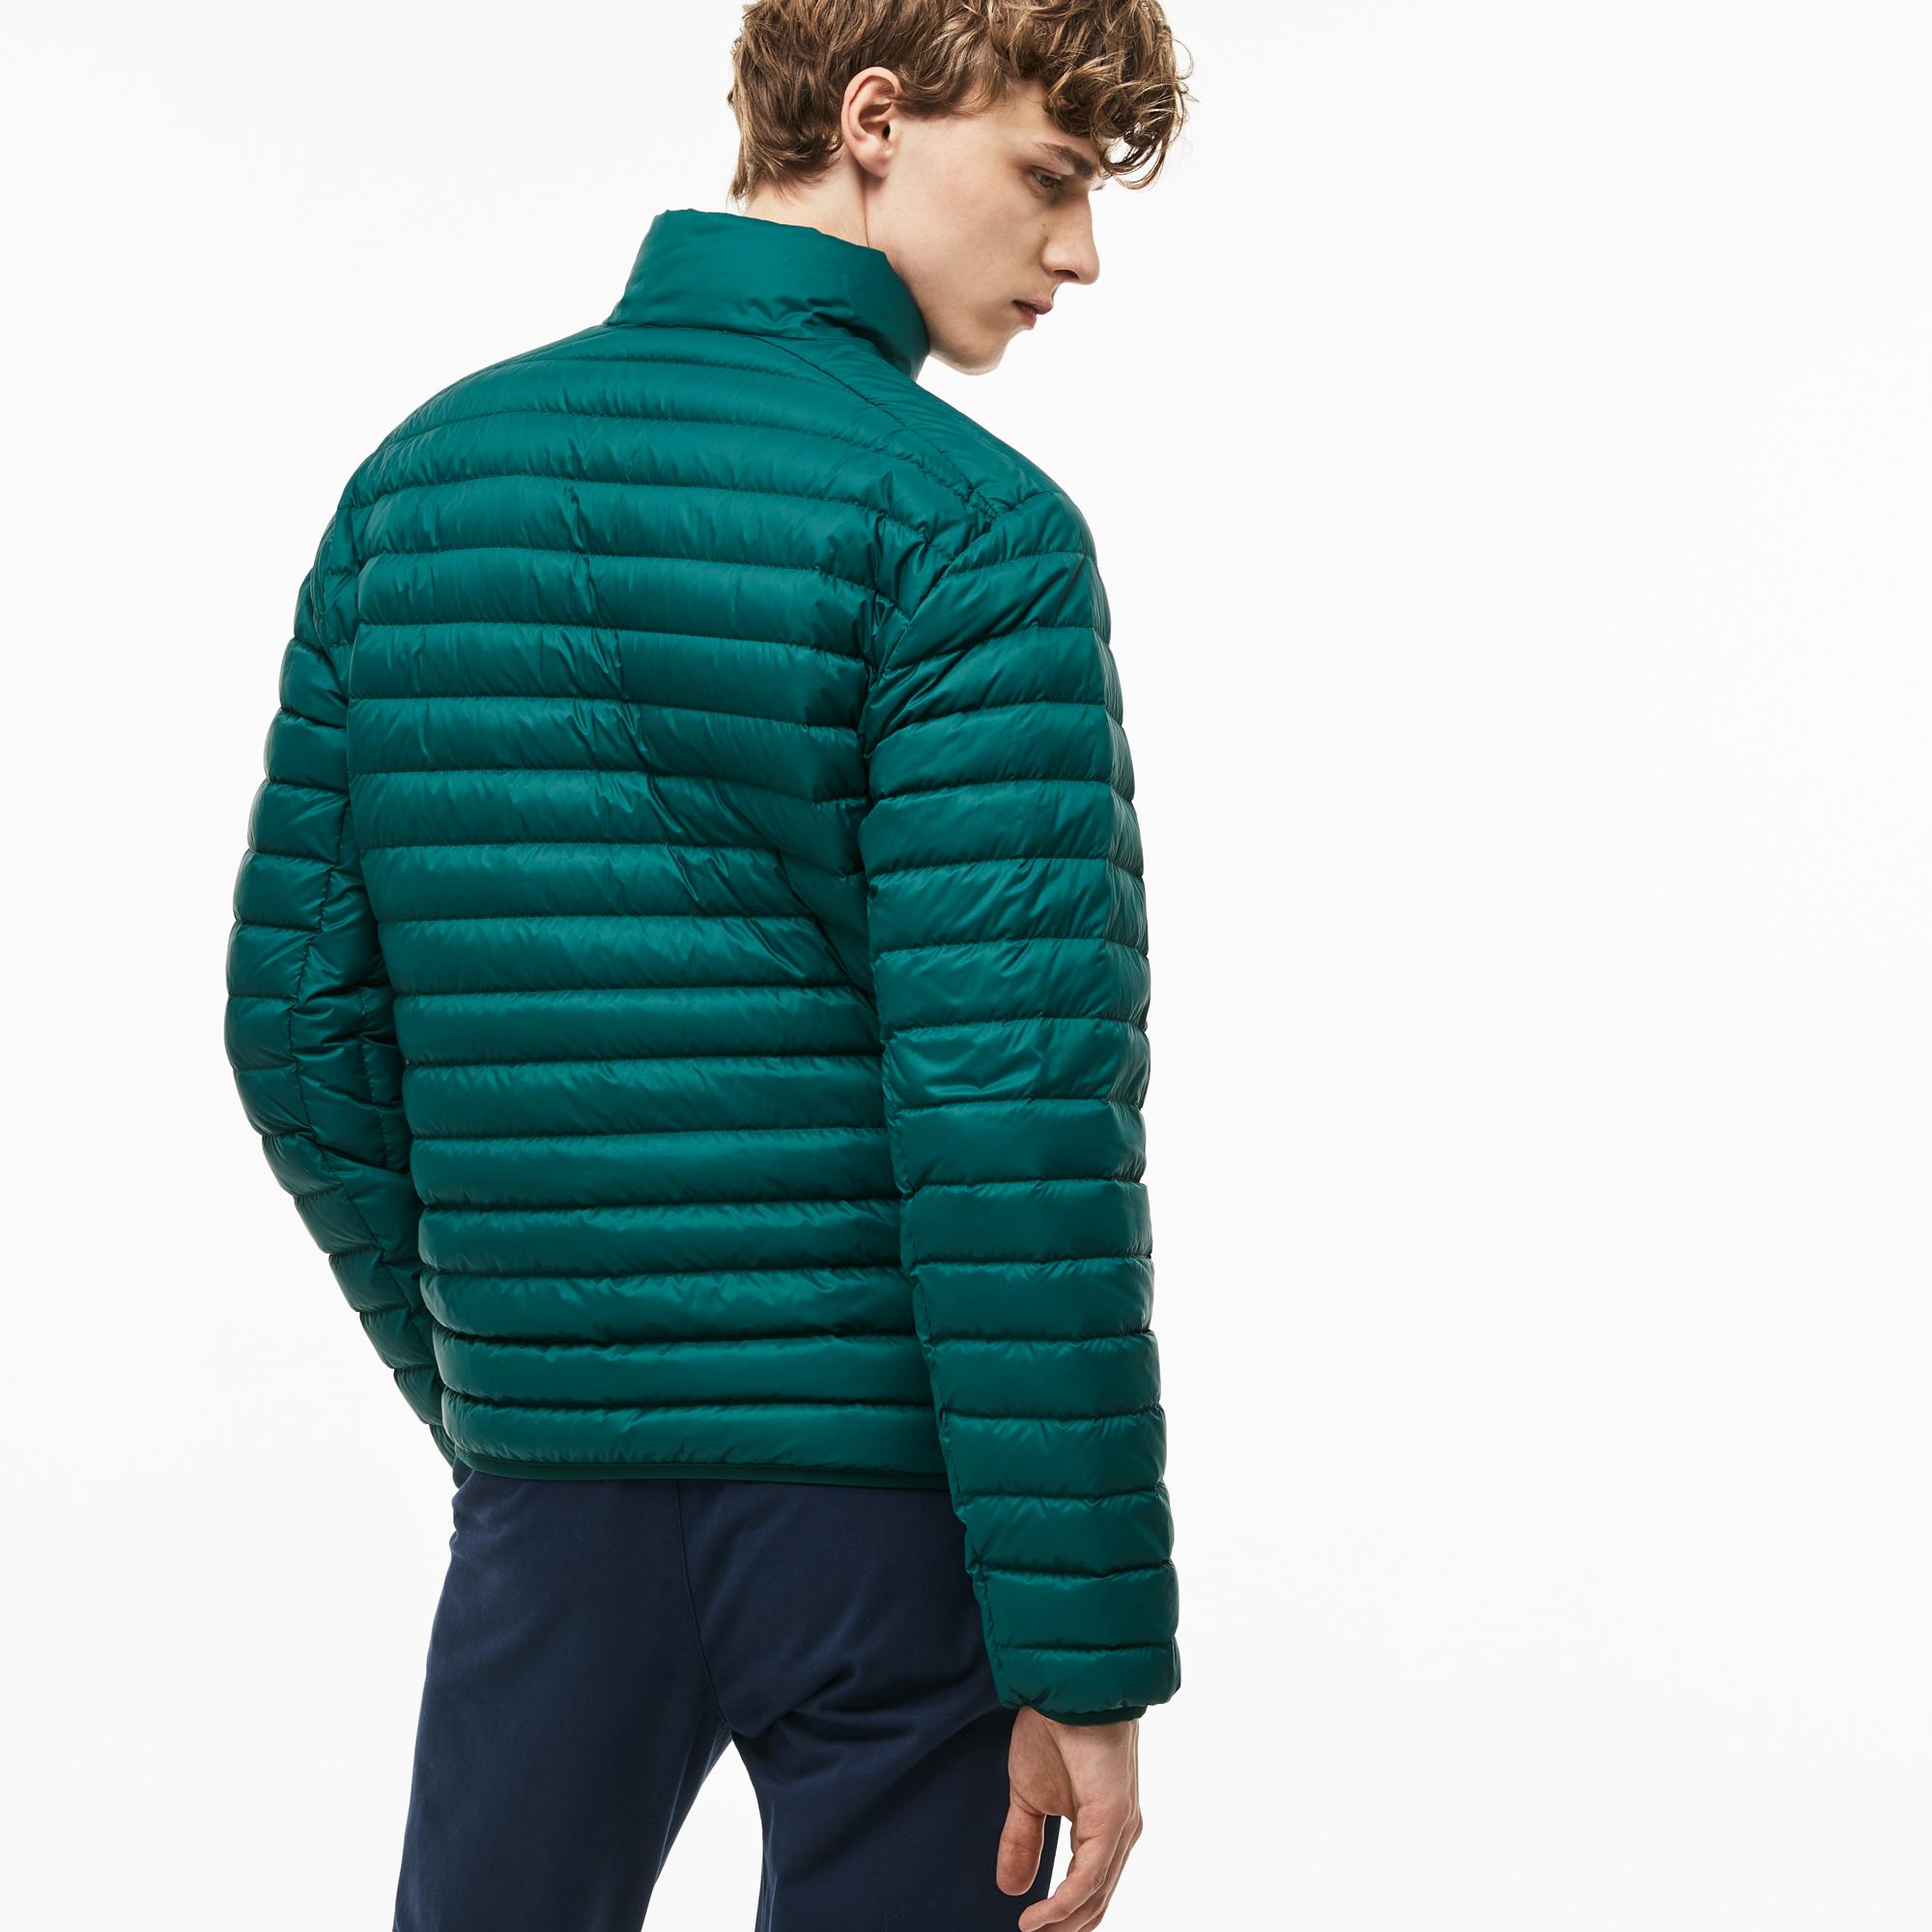 Куртка Lacoste за 17 350 руб. купить в интернет-магазине 07ad9b31ae8